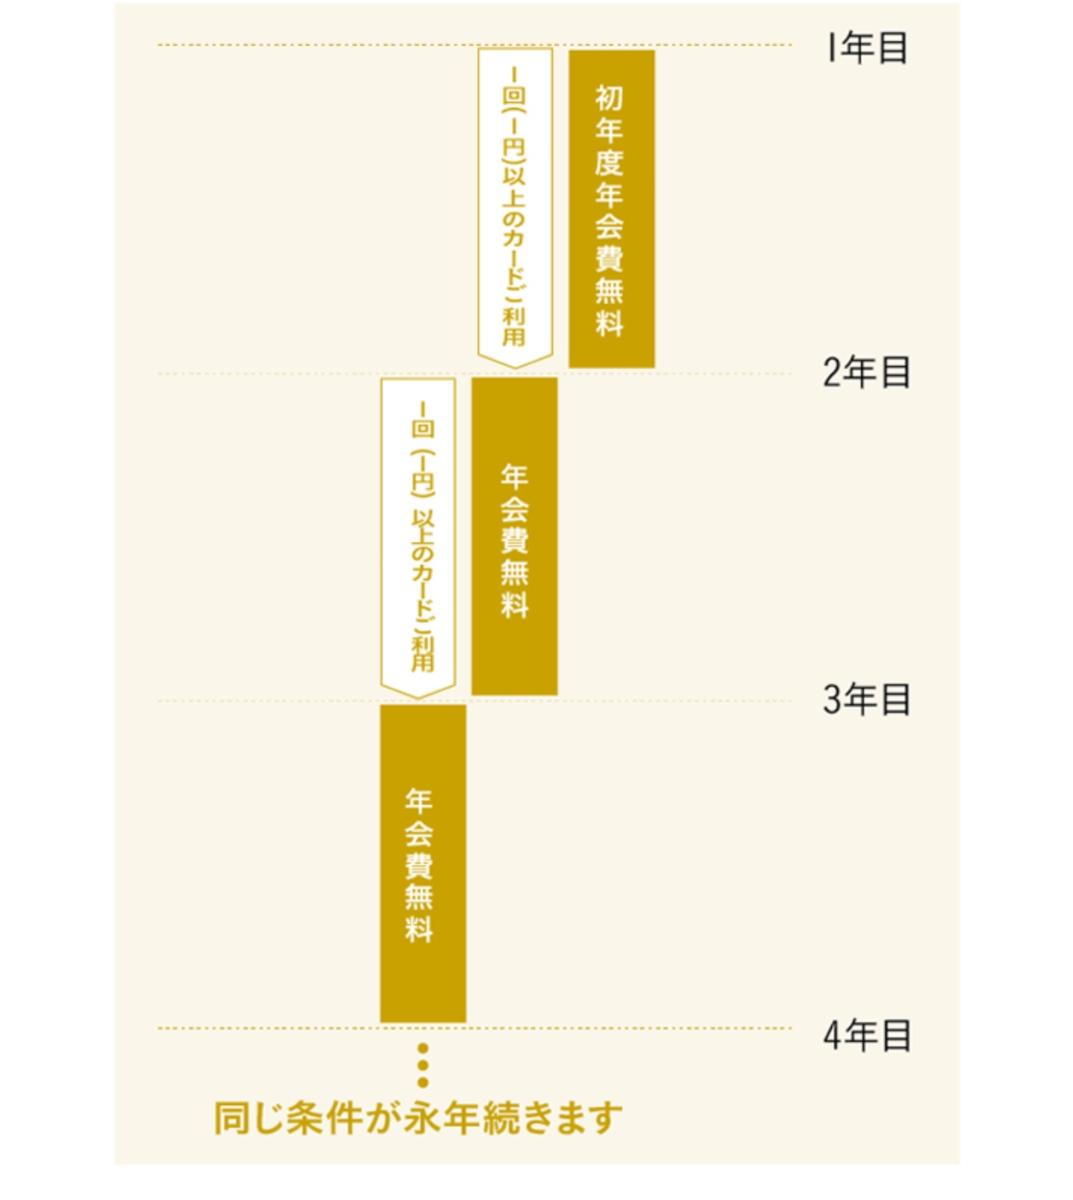 f:id:SeisoSakuya:20190501153715p:plain